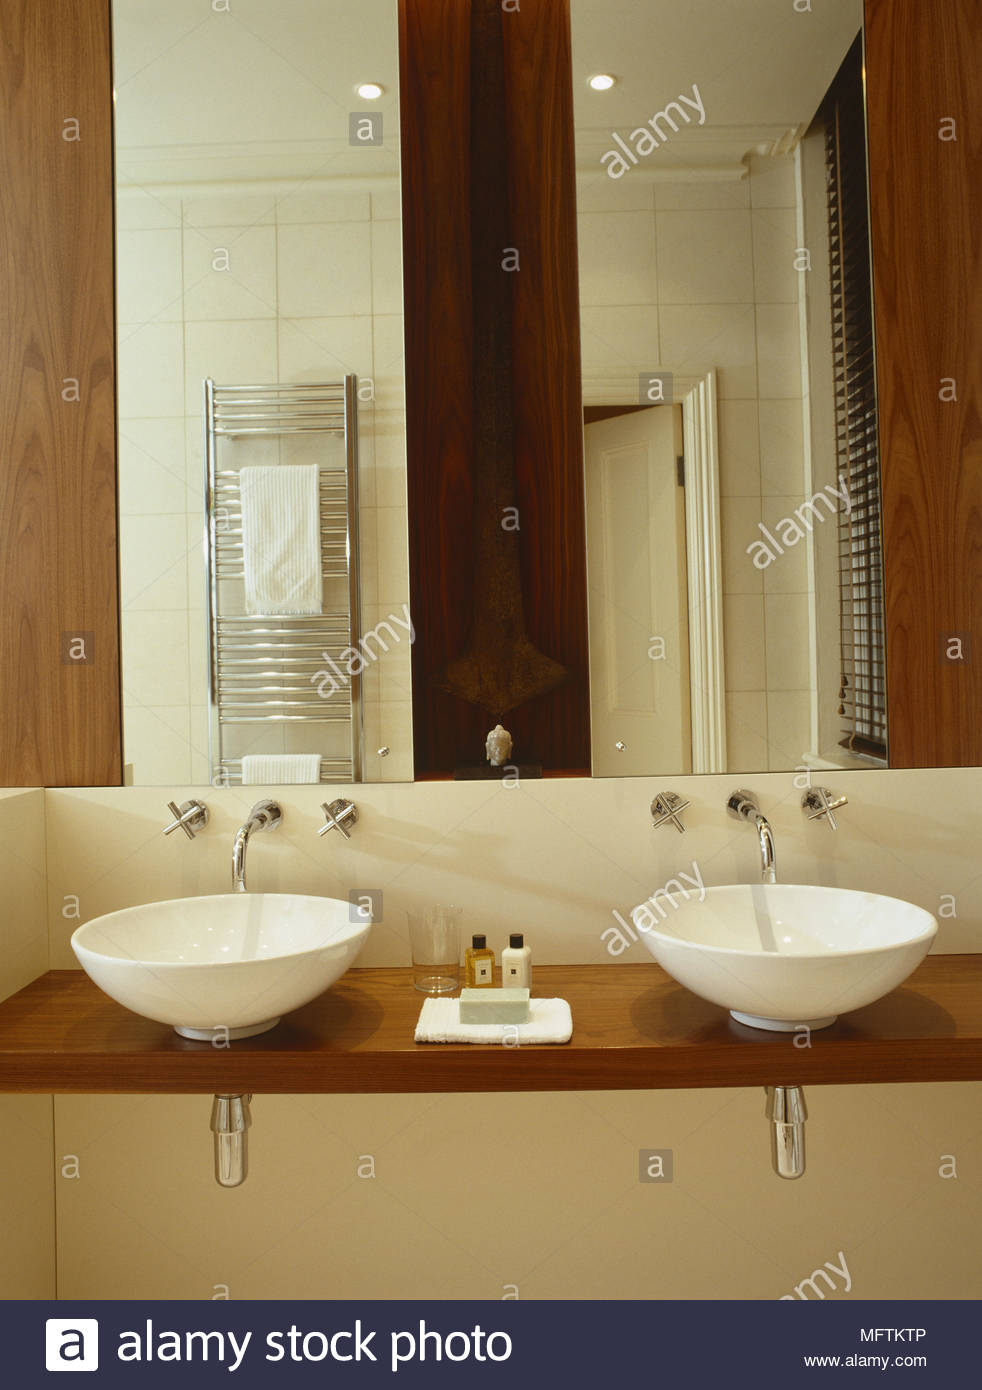 A detail of a modern neutral bathroom twin washbasins set on wooden ...